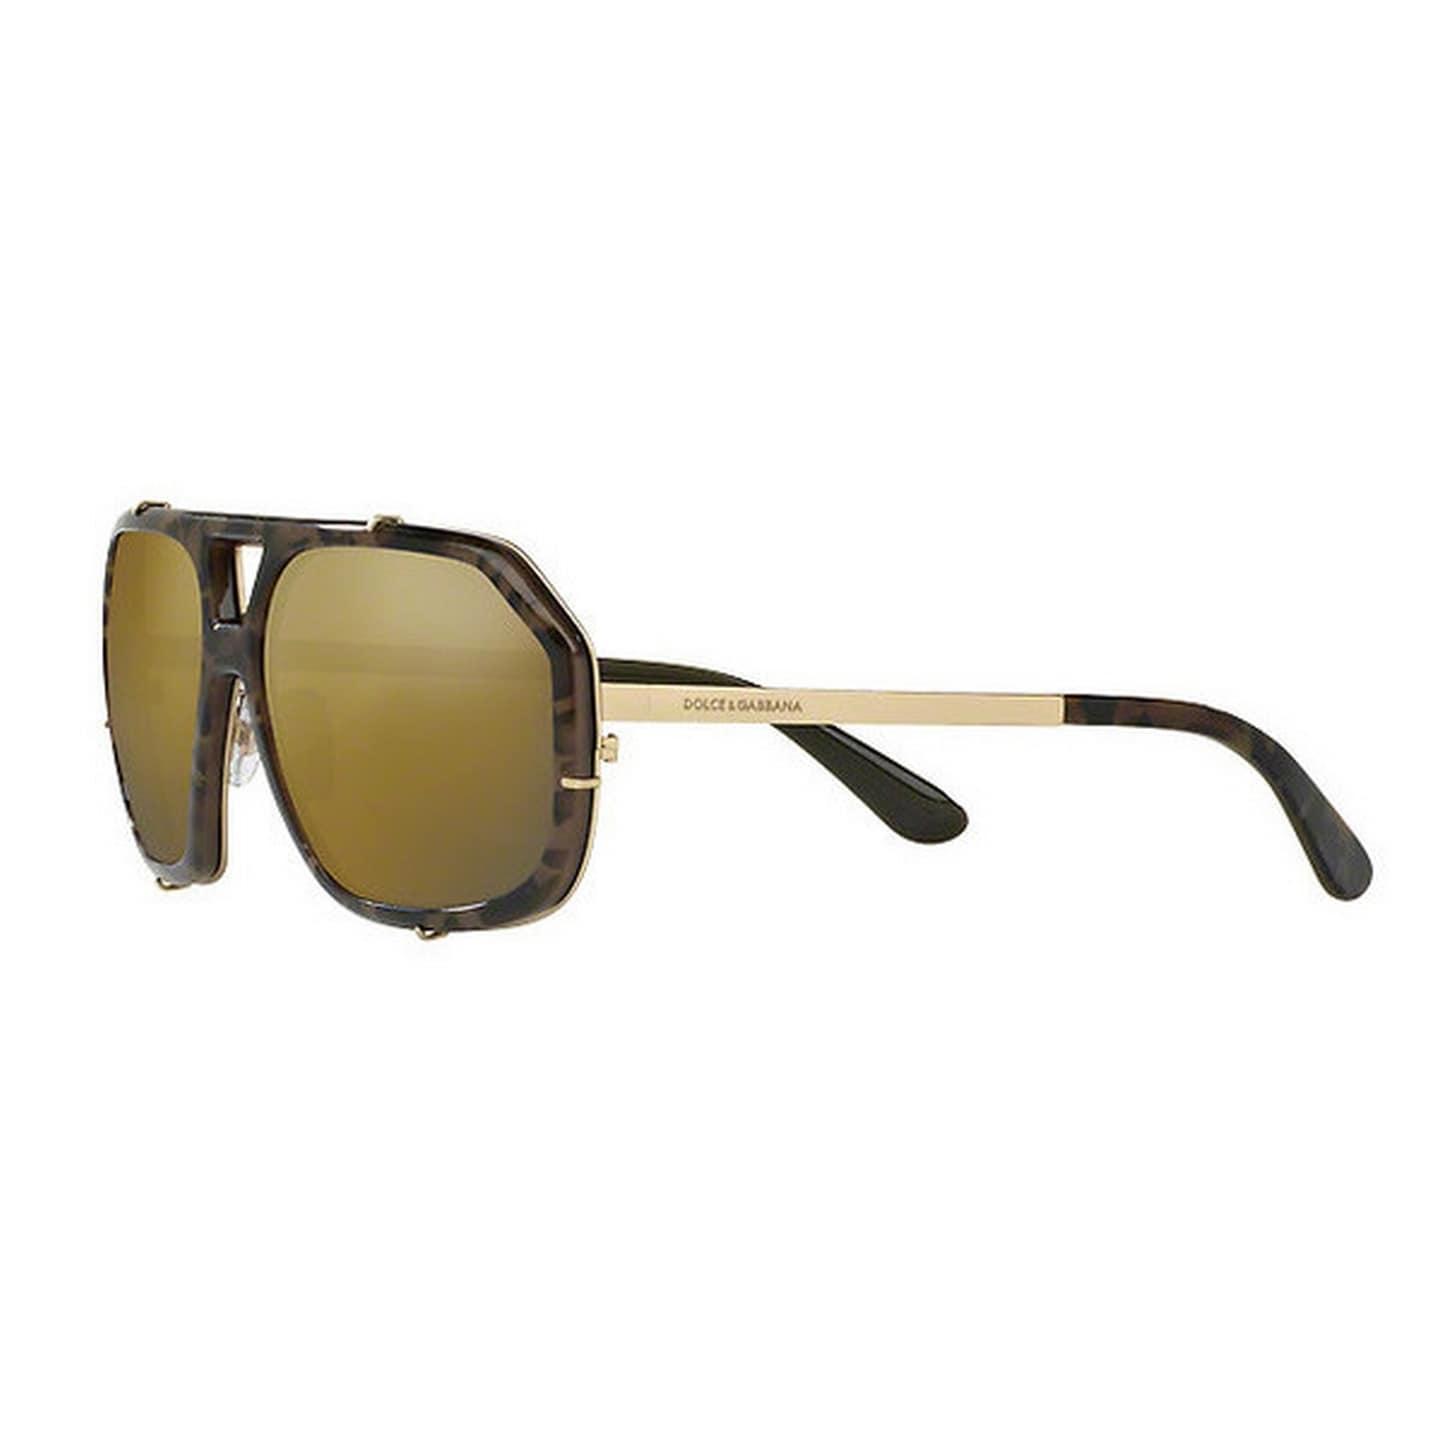 6a1ea34cb790 Shop Dolce & Gabbana Men's DG2167 1306W7 61 Aviator Metal Plastic Clear  Eyeglasses - Free Shipping Today - Overstock - 14799427